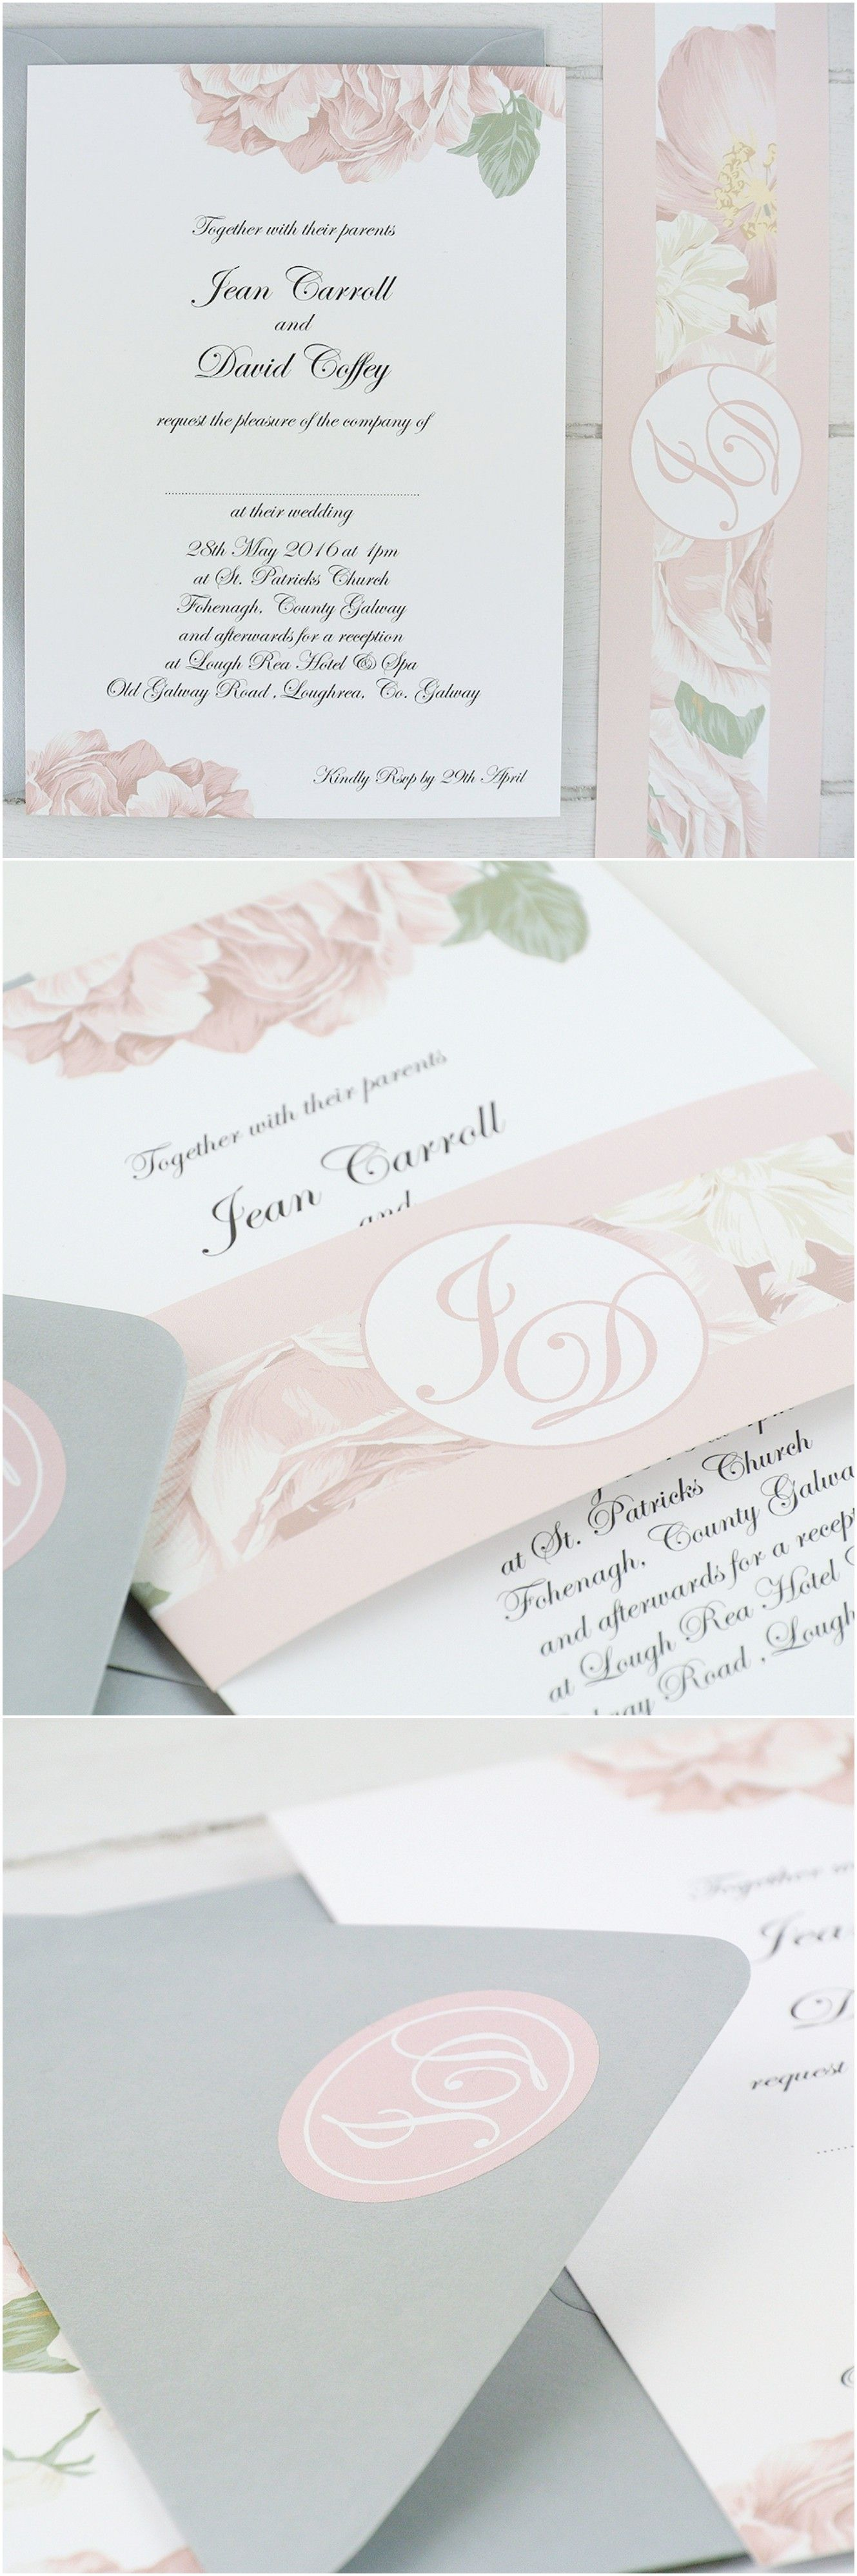 Blush Pink Peony Rose Wedding Invitation With Personalised Wedding Monogram Belly Band Rose Wedding Invitations Peony Wedding Invitations Wedding Invitations